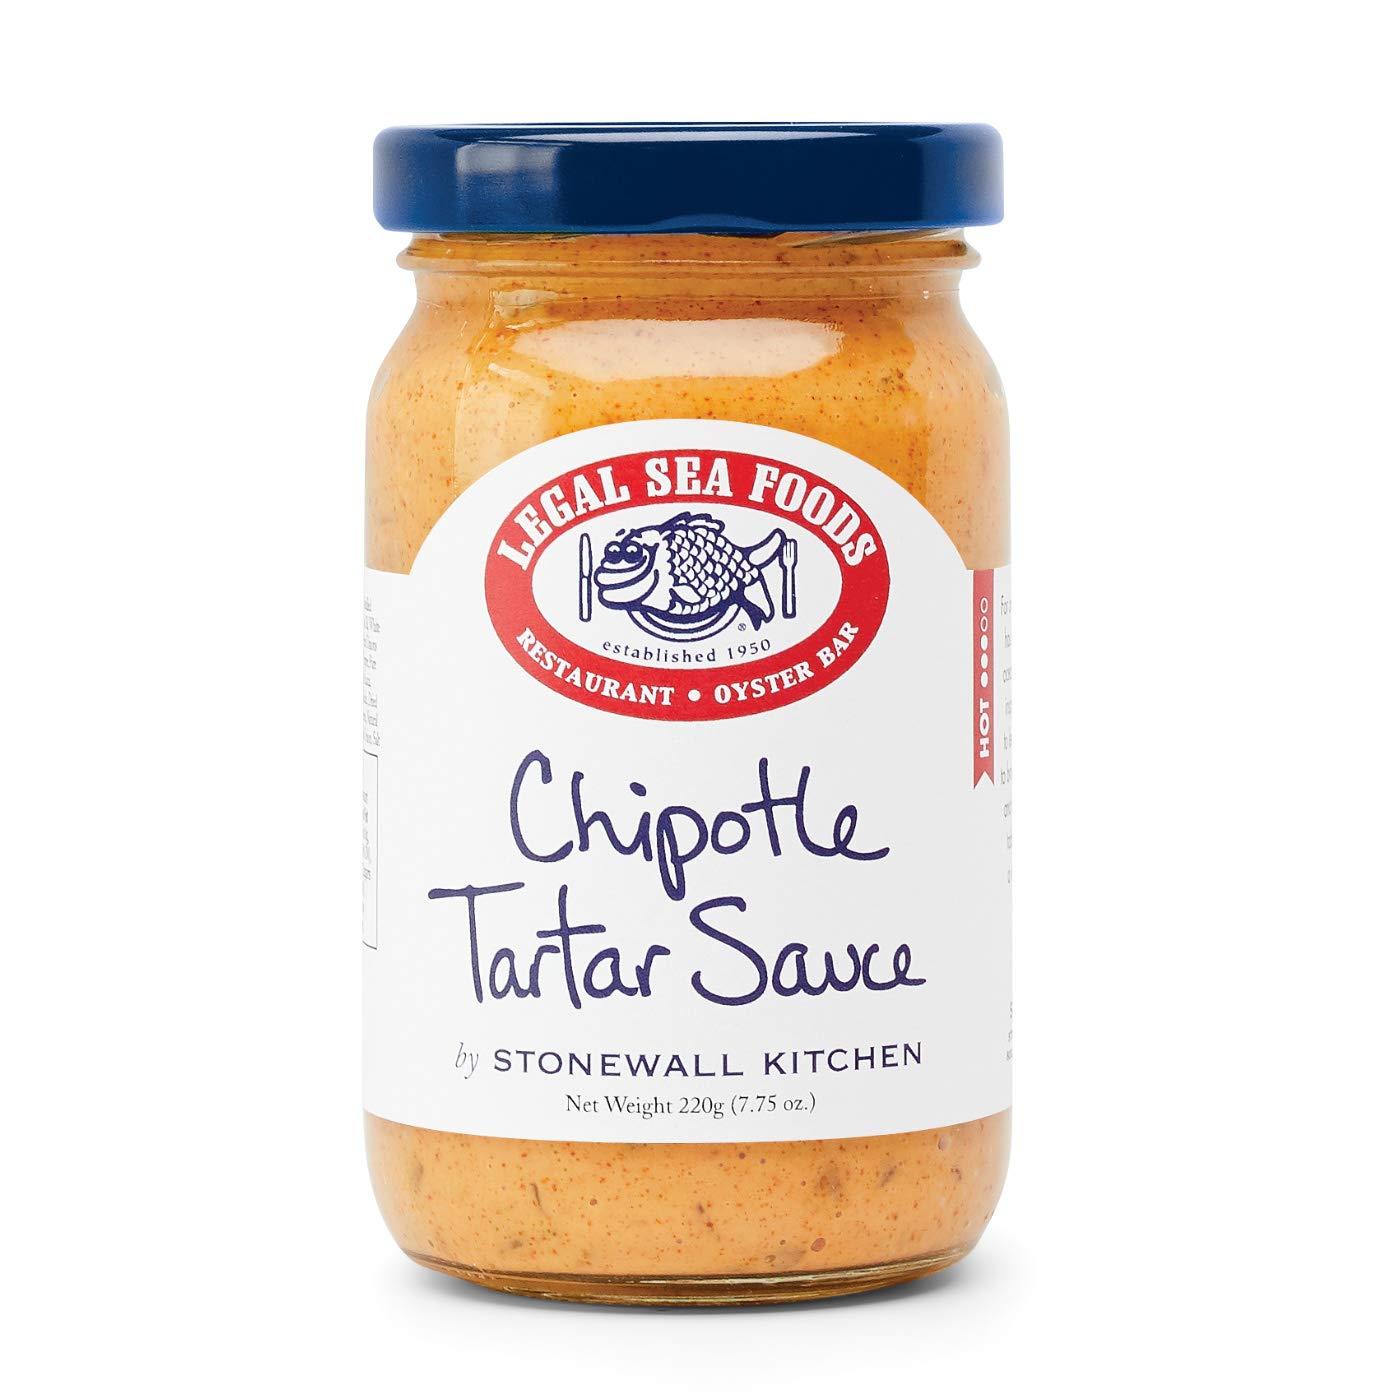 Legal Sea Foods Chipotle Tartar Sauce, 7.75 oz